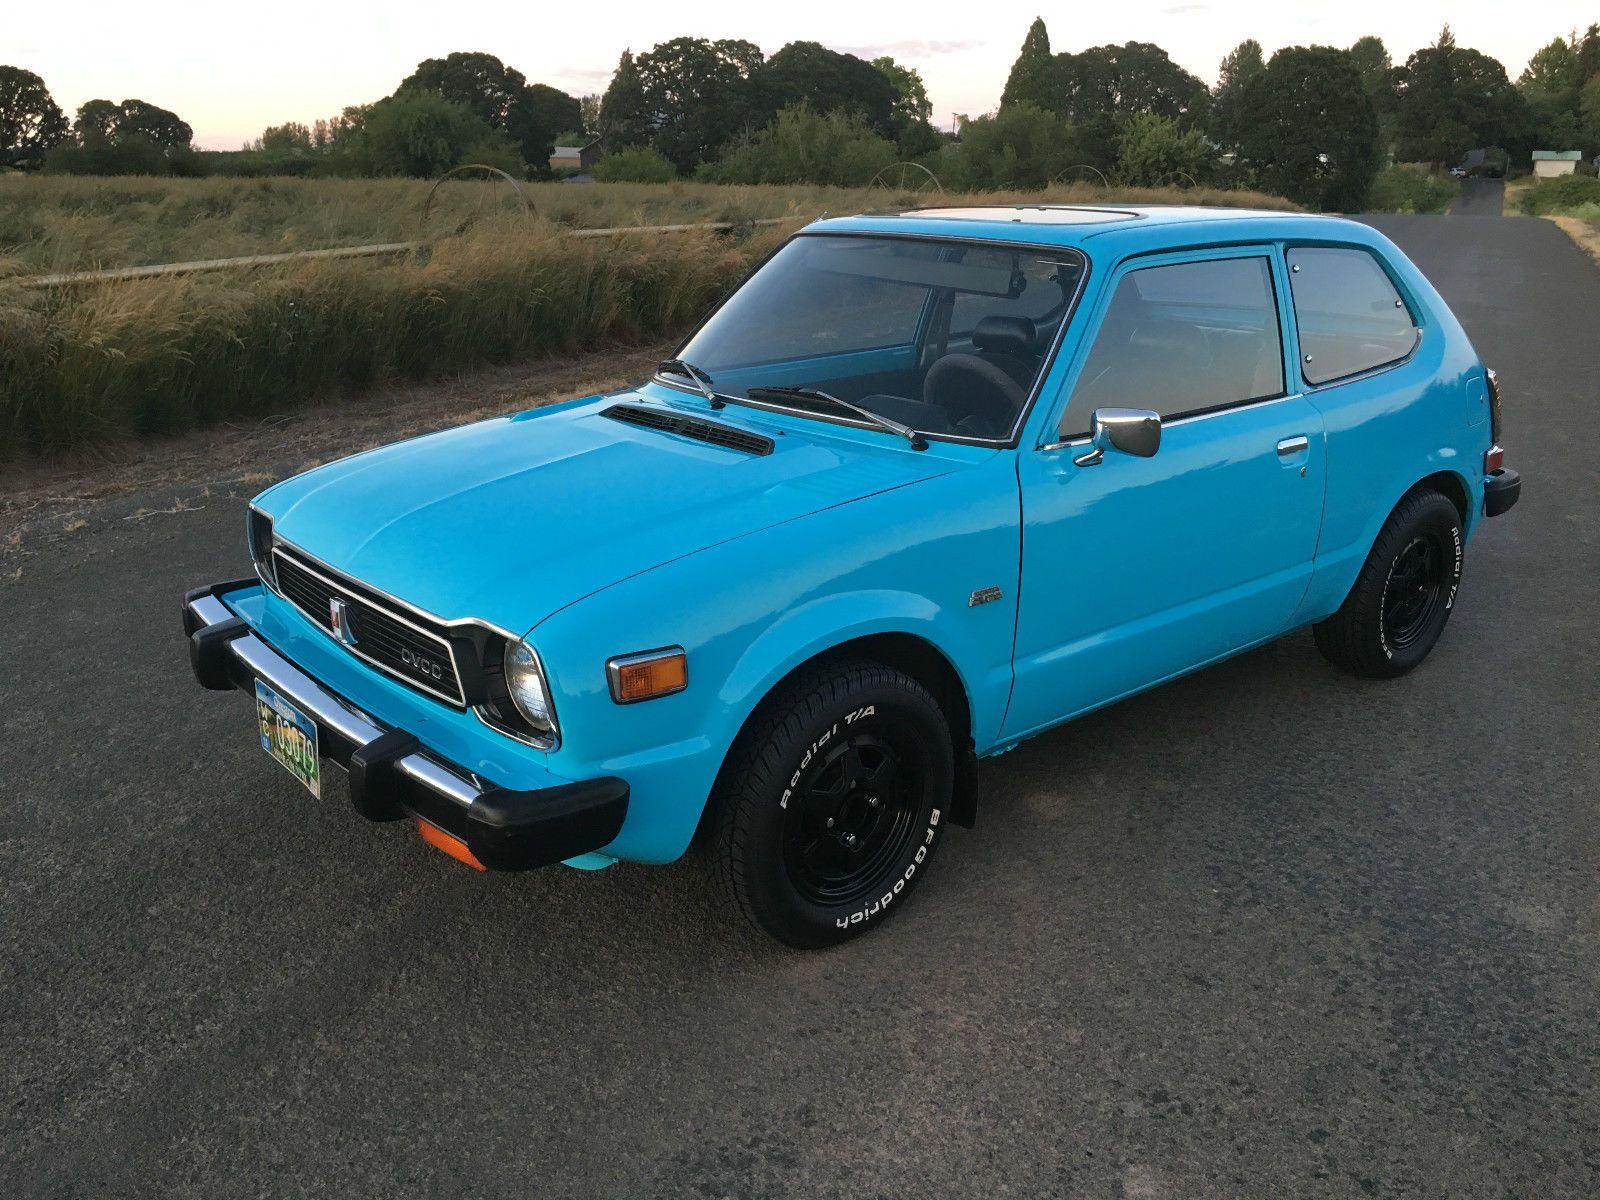 Car brand auctionedHonda Civic 3Door Hatchback 1978 Car